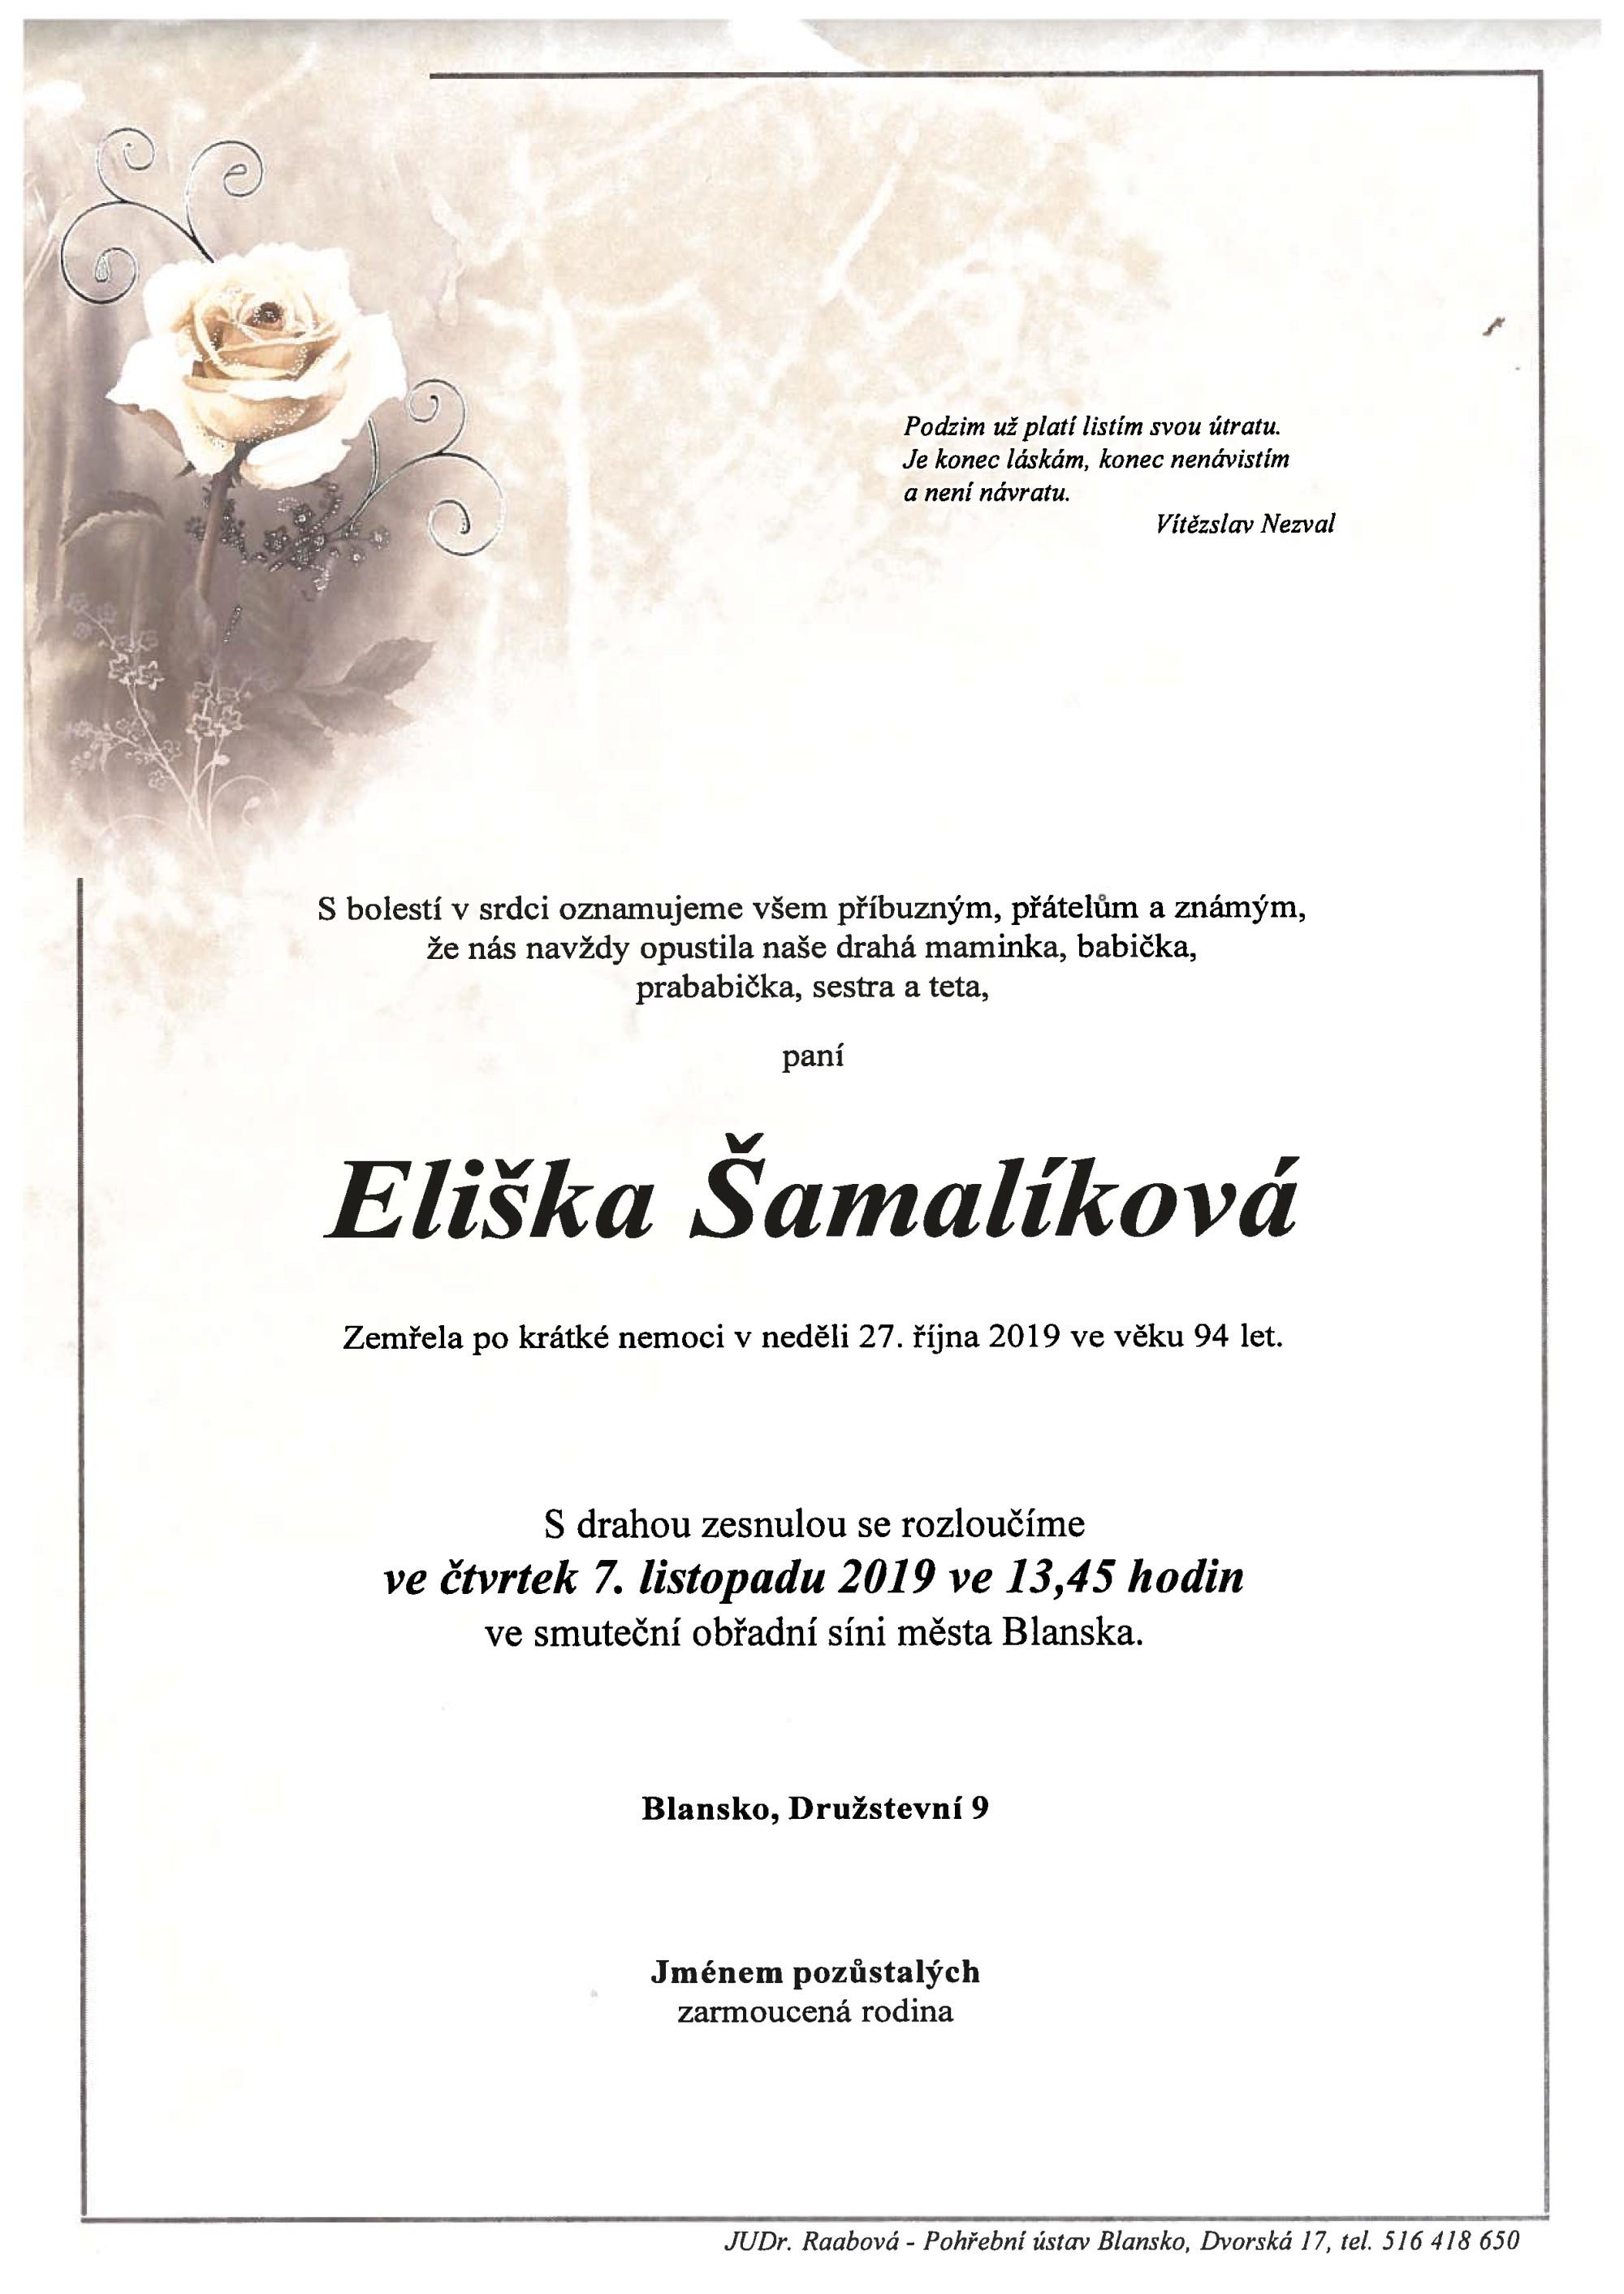 Eliška Šamalíková